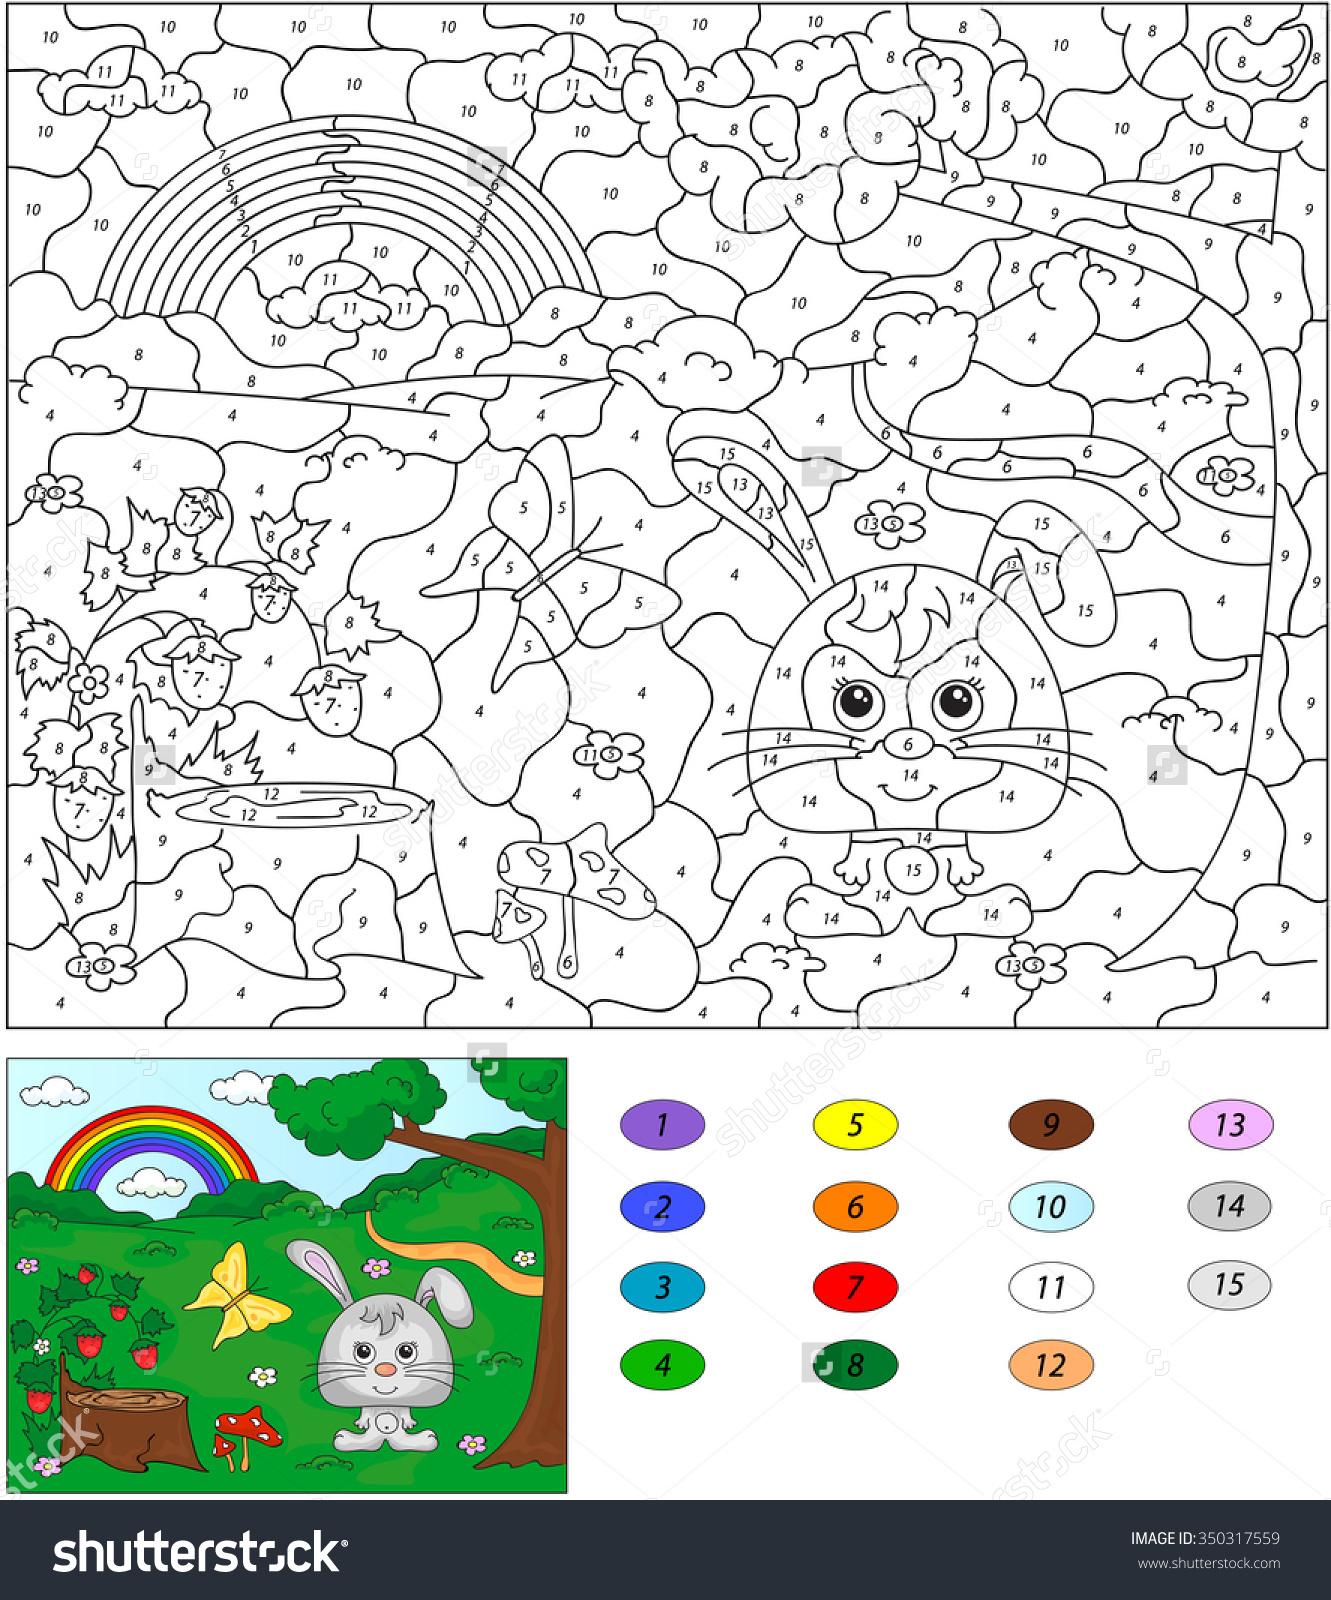 Stub coloring #1, Download drawings